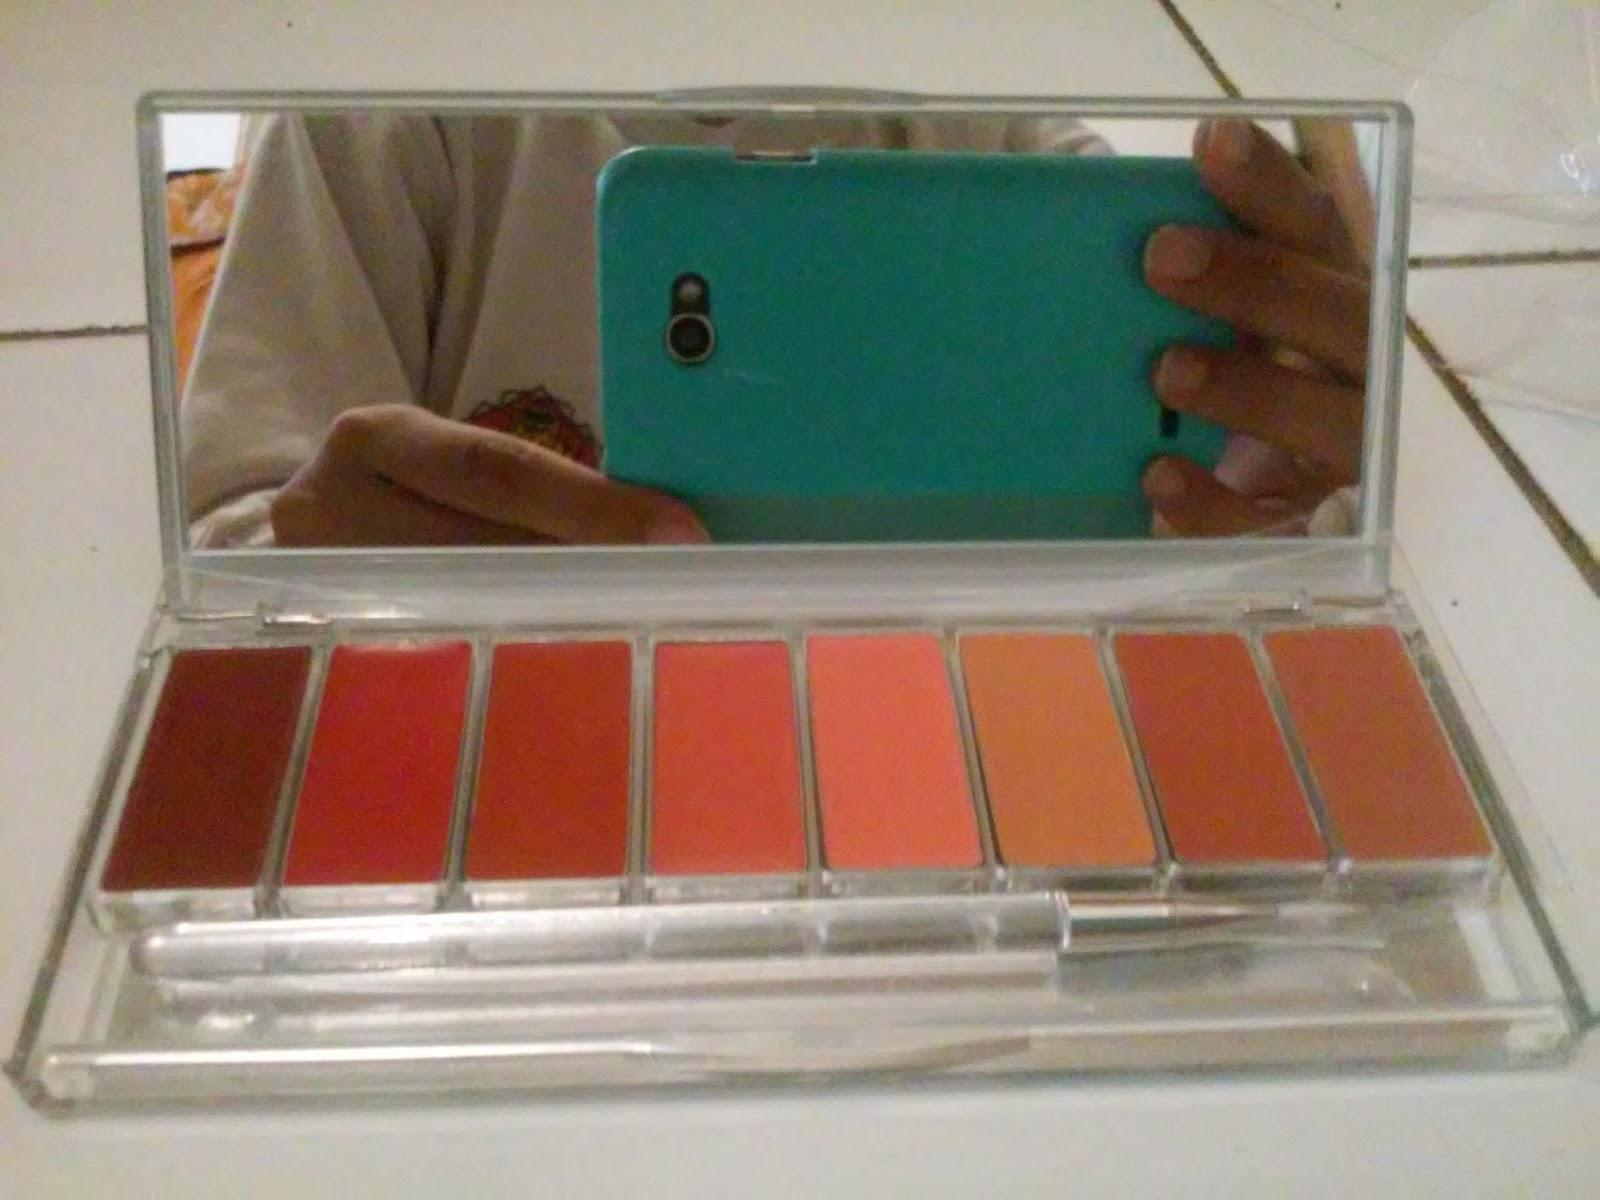 Wardah Lip Palette Chocoaholic The Art Of Beauty Pinky Peach Review Halal La Blog